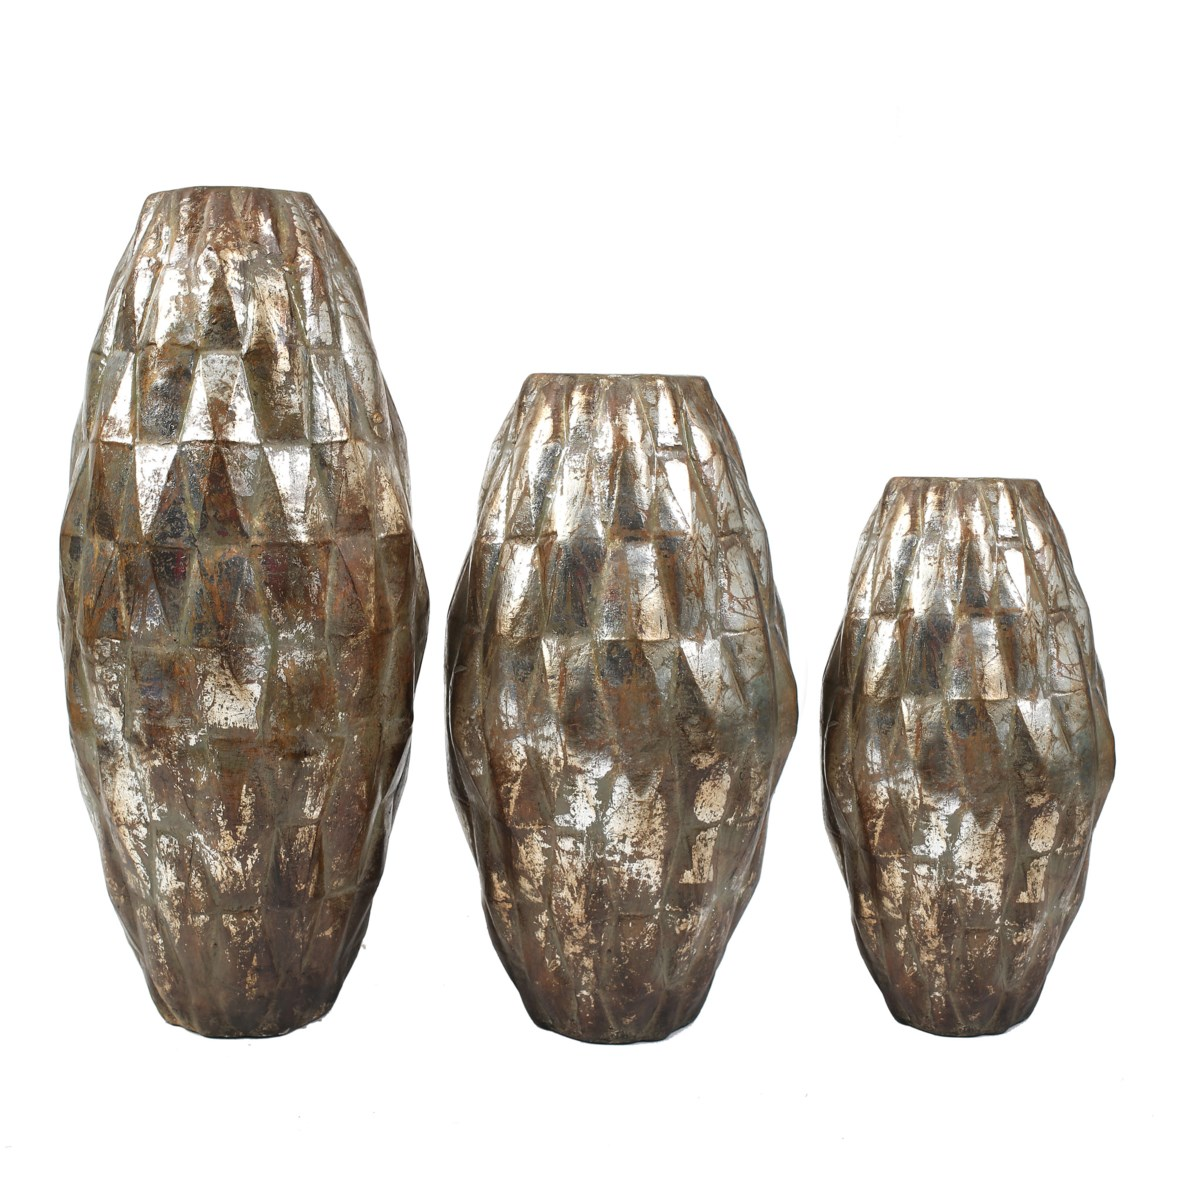 Set of 3 Diamond Floor Vases in Silver Finish